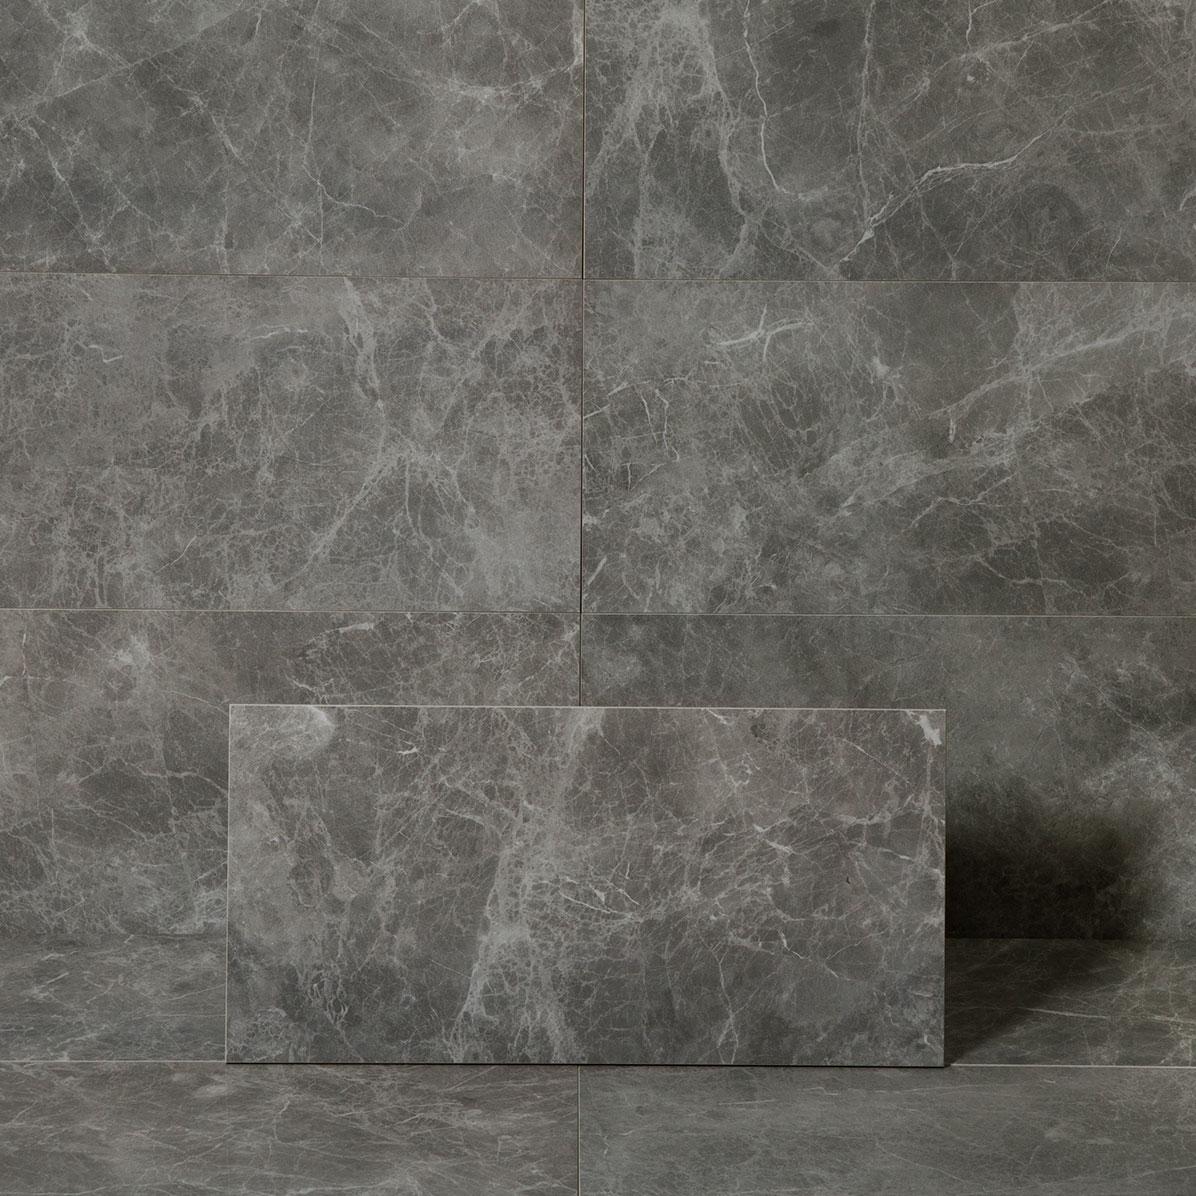 Klinker Marmorea2 Jolie Grey 30×60 cm Blank